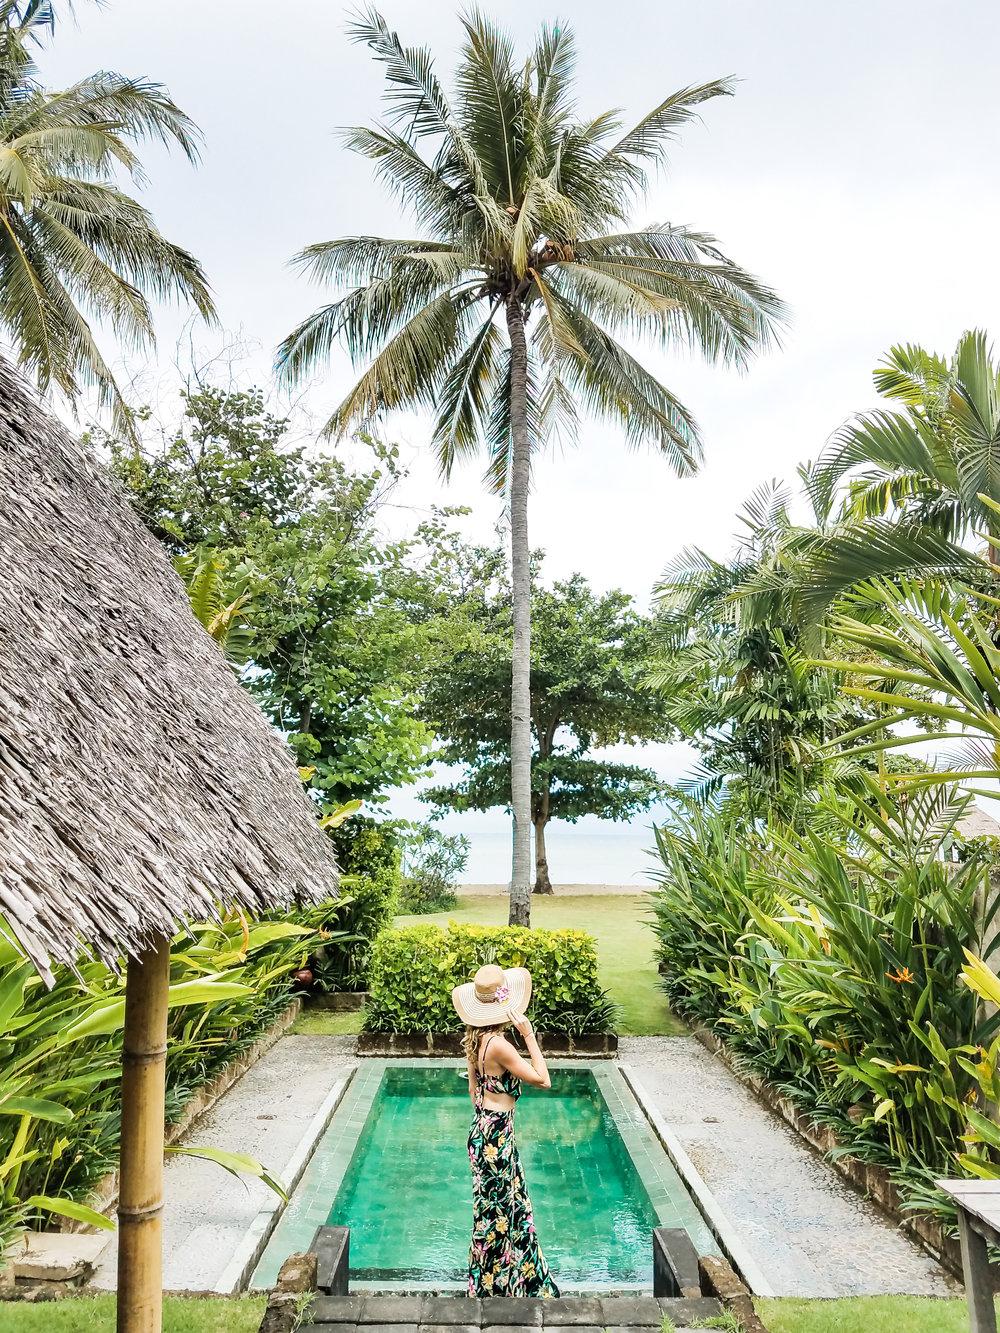 Enjoying my own private pool at Hotel Tugu